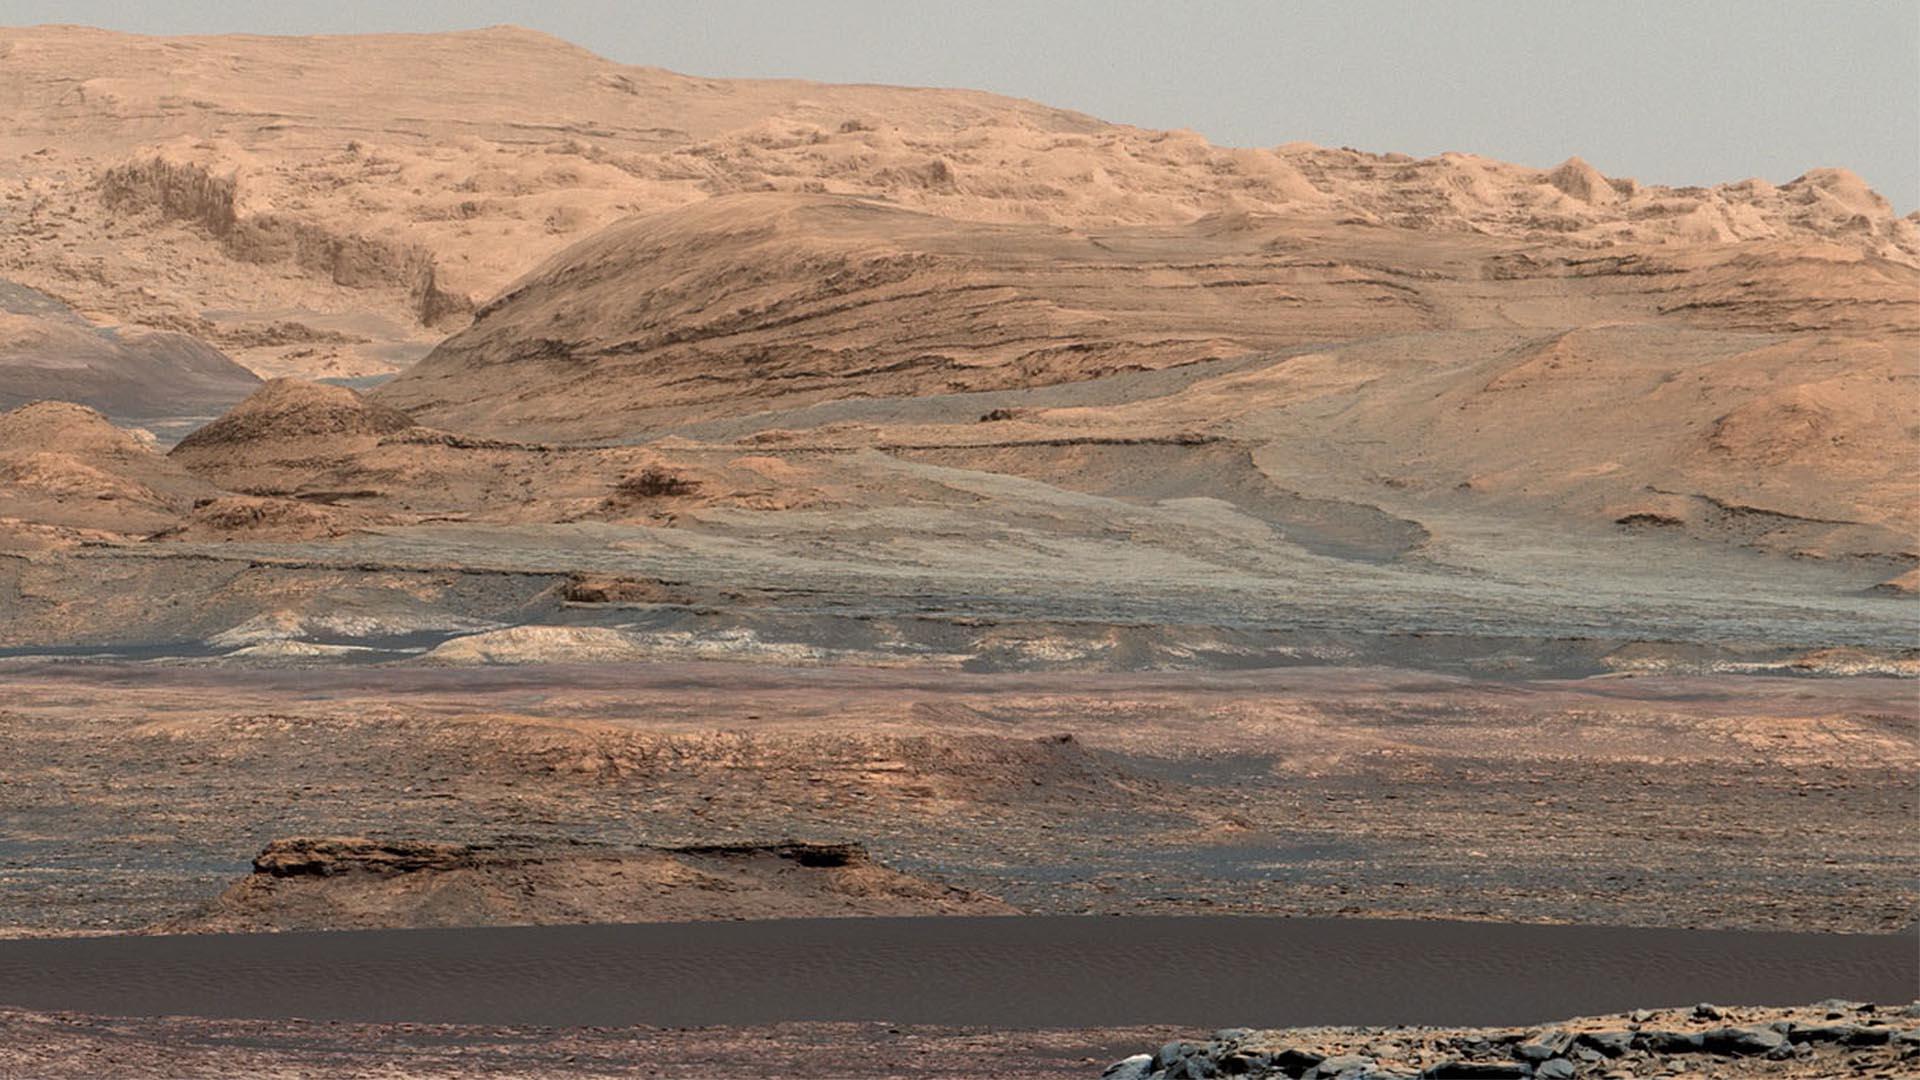 mars-science-lab-curiosity-gale-crater-mount-sharp-bagnold-dunes-dune-field-desk-1920.jpg